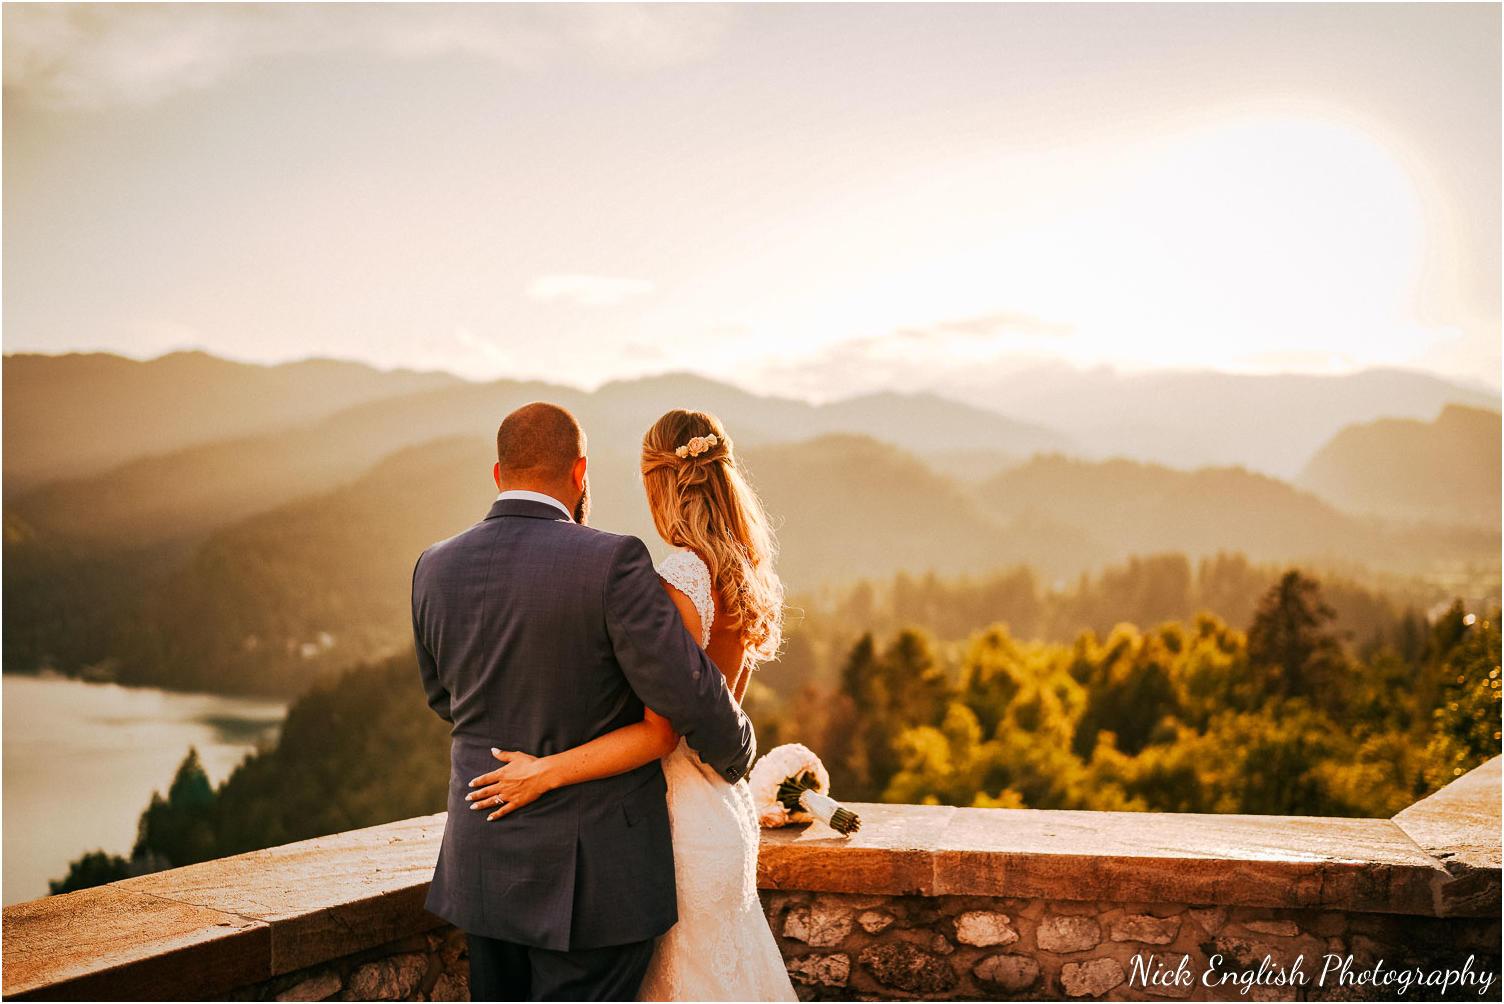 Destination_Wedding_Photographer_Slovenia_Nick_English_Photography-70-34.jpg